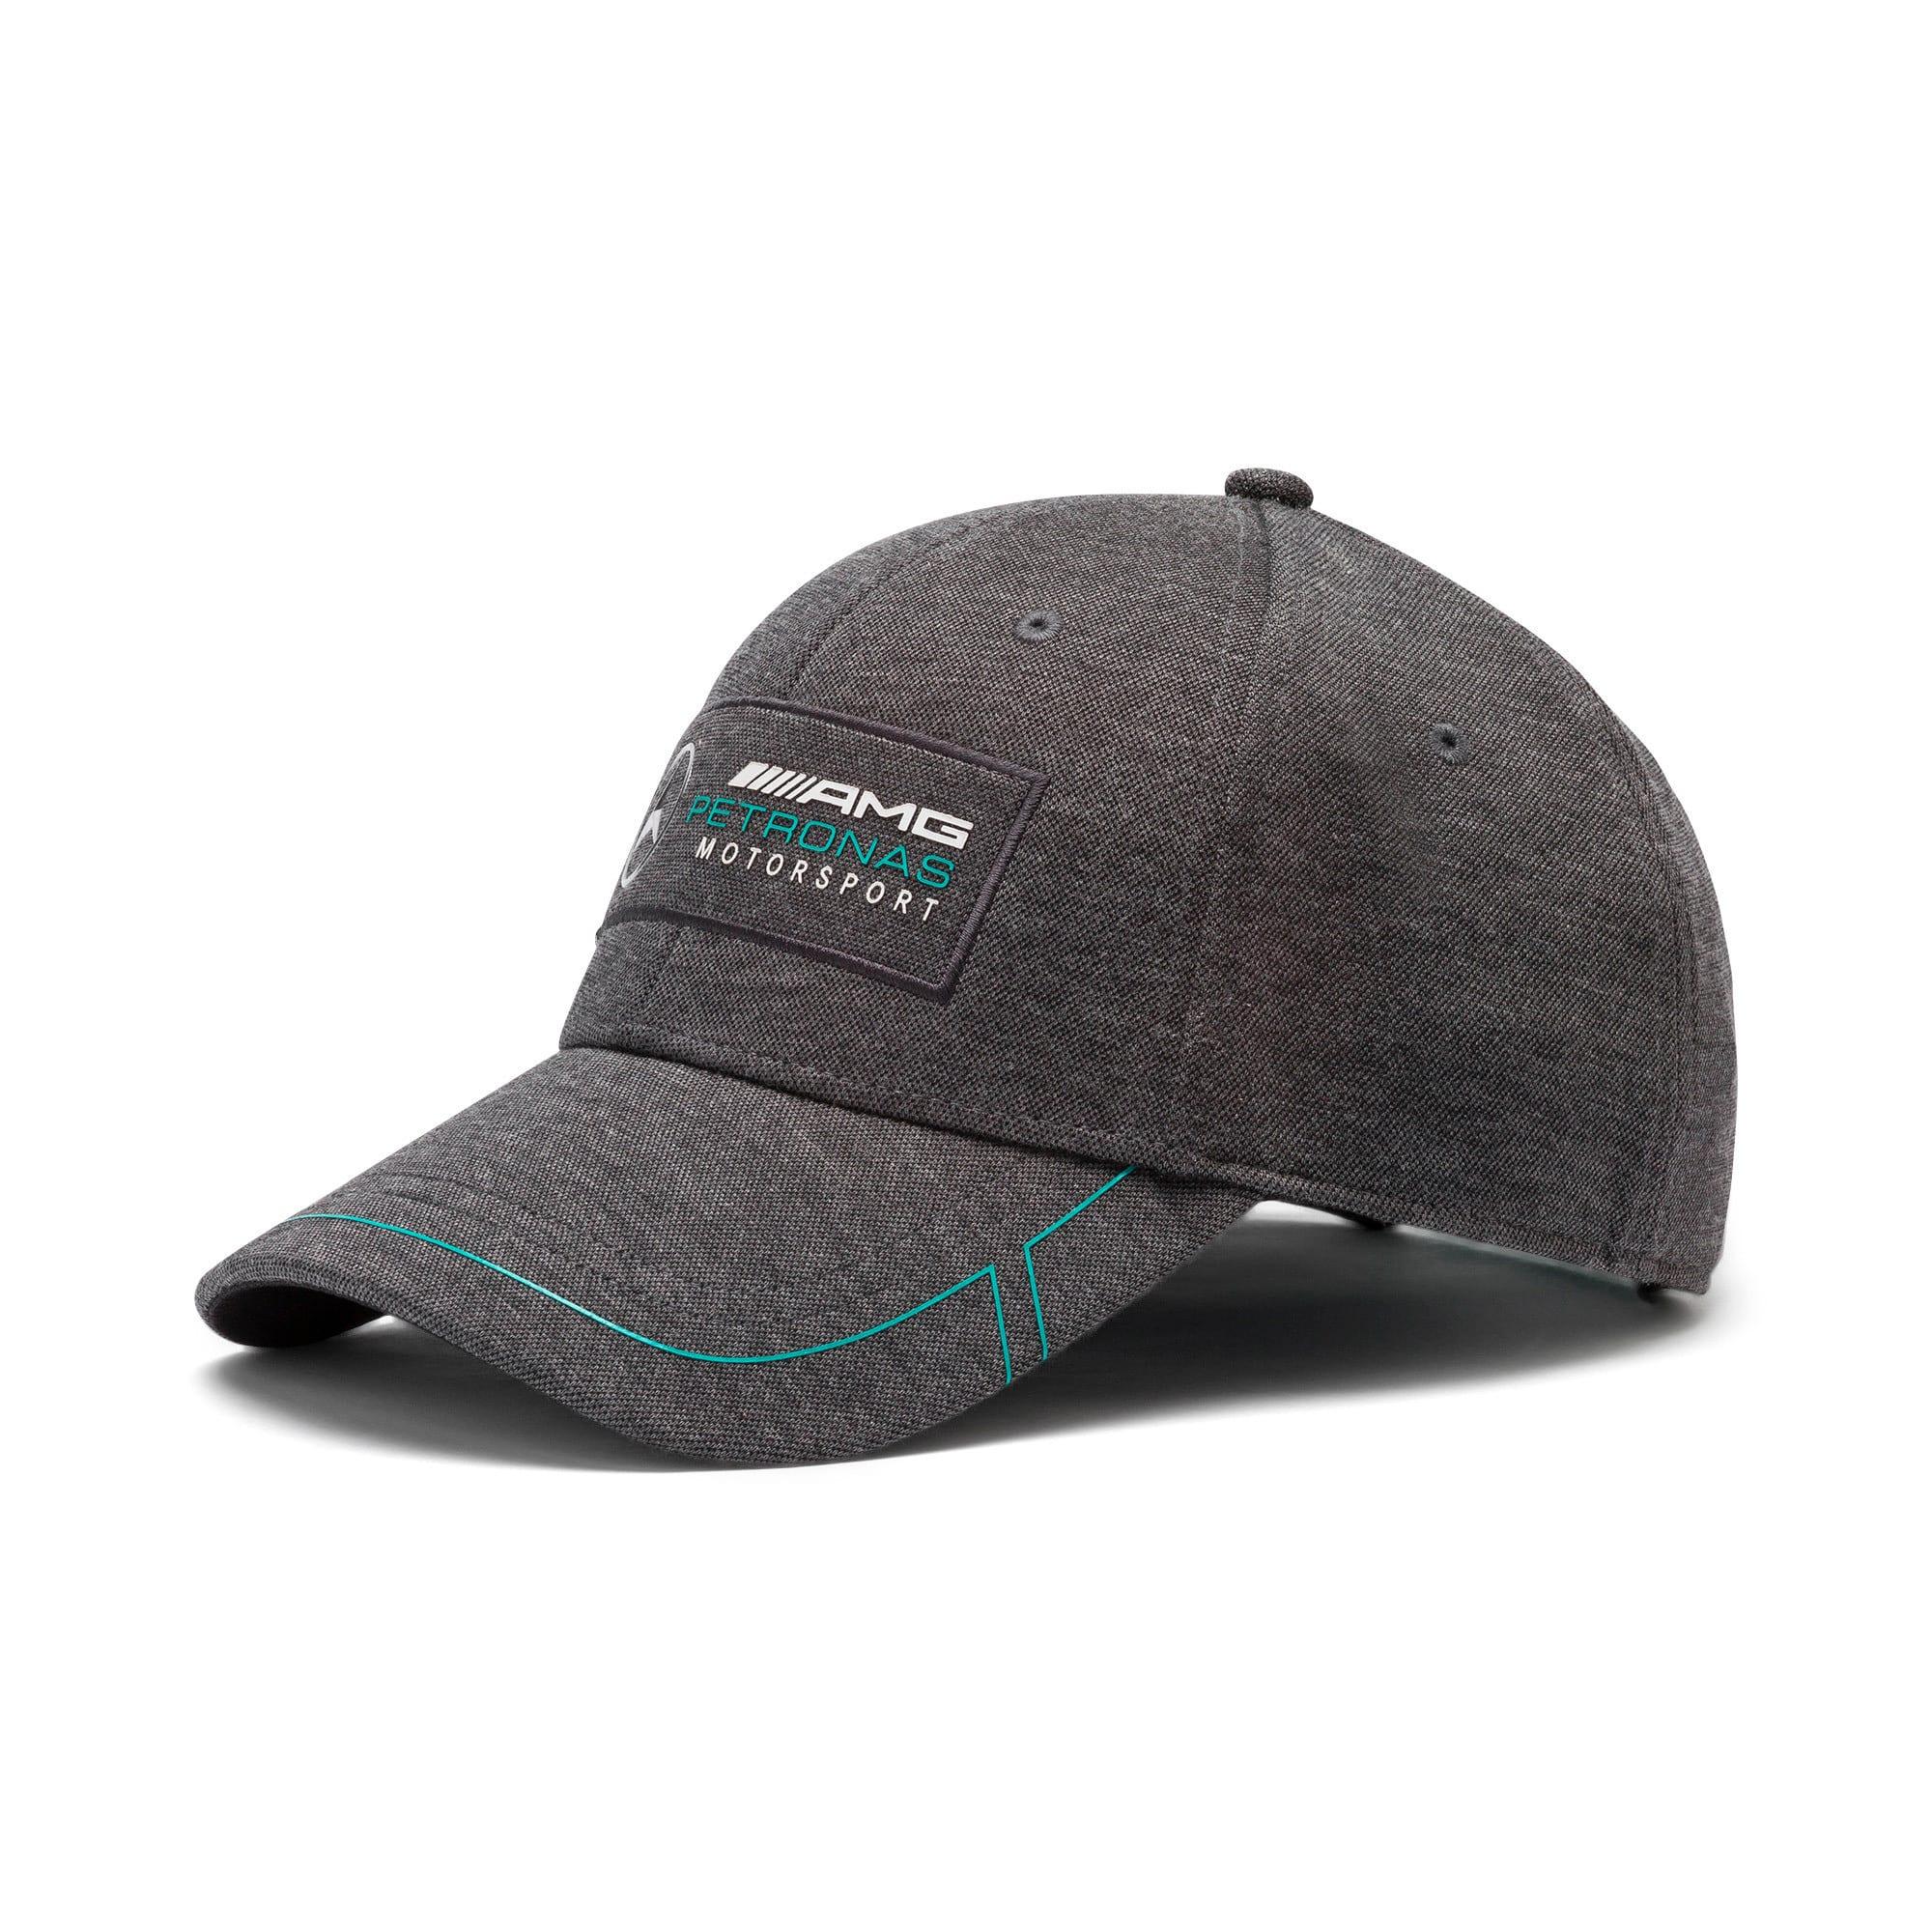 Thumbnail 1 of Mercedes AMG Petronas Motorsport Baseball Cap, Puma Black, medium-IND